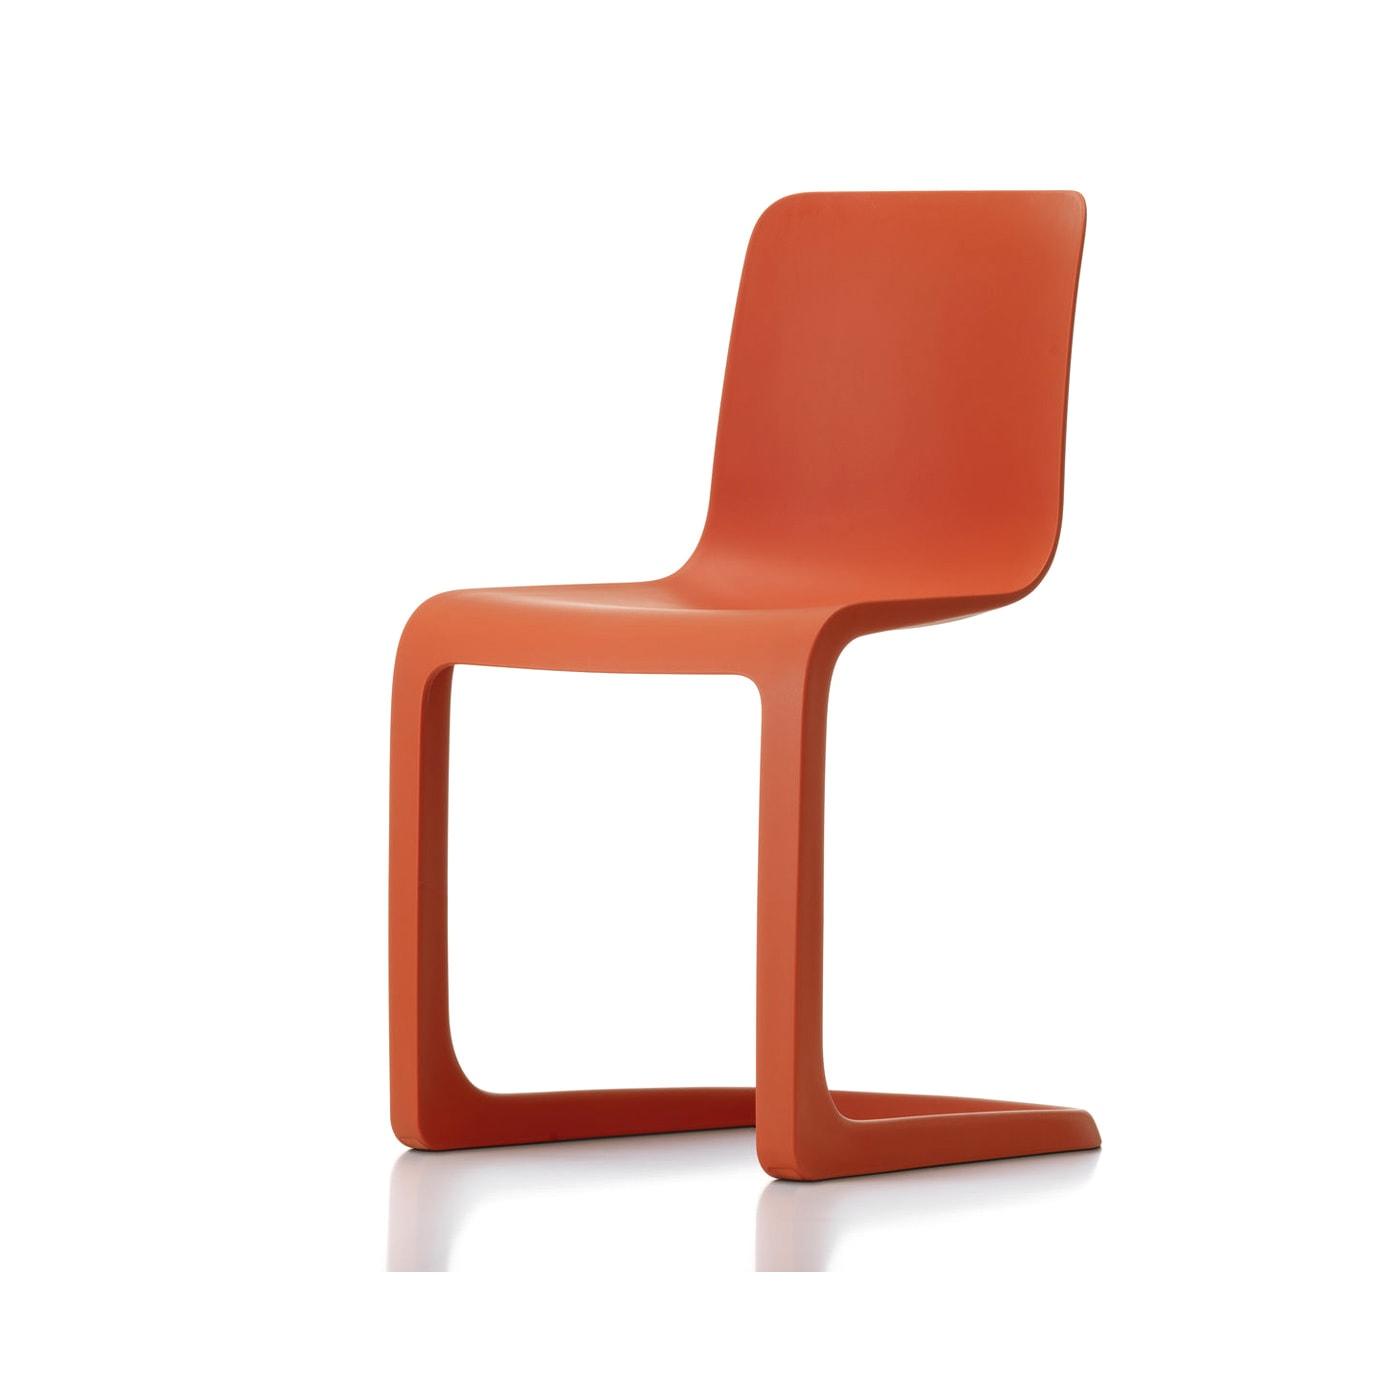 vitra evo-c sedia a sbalzo - vendita online